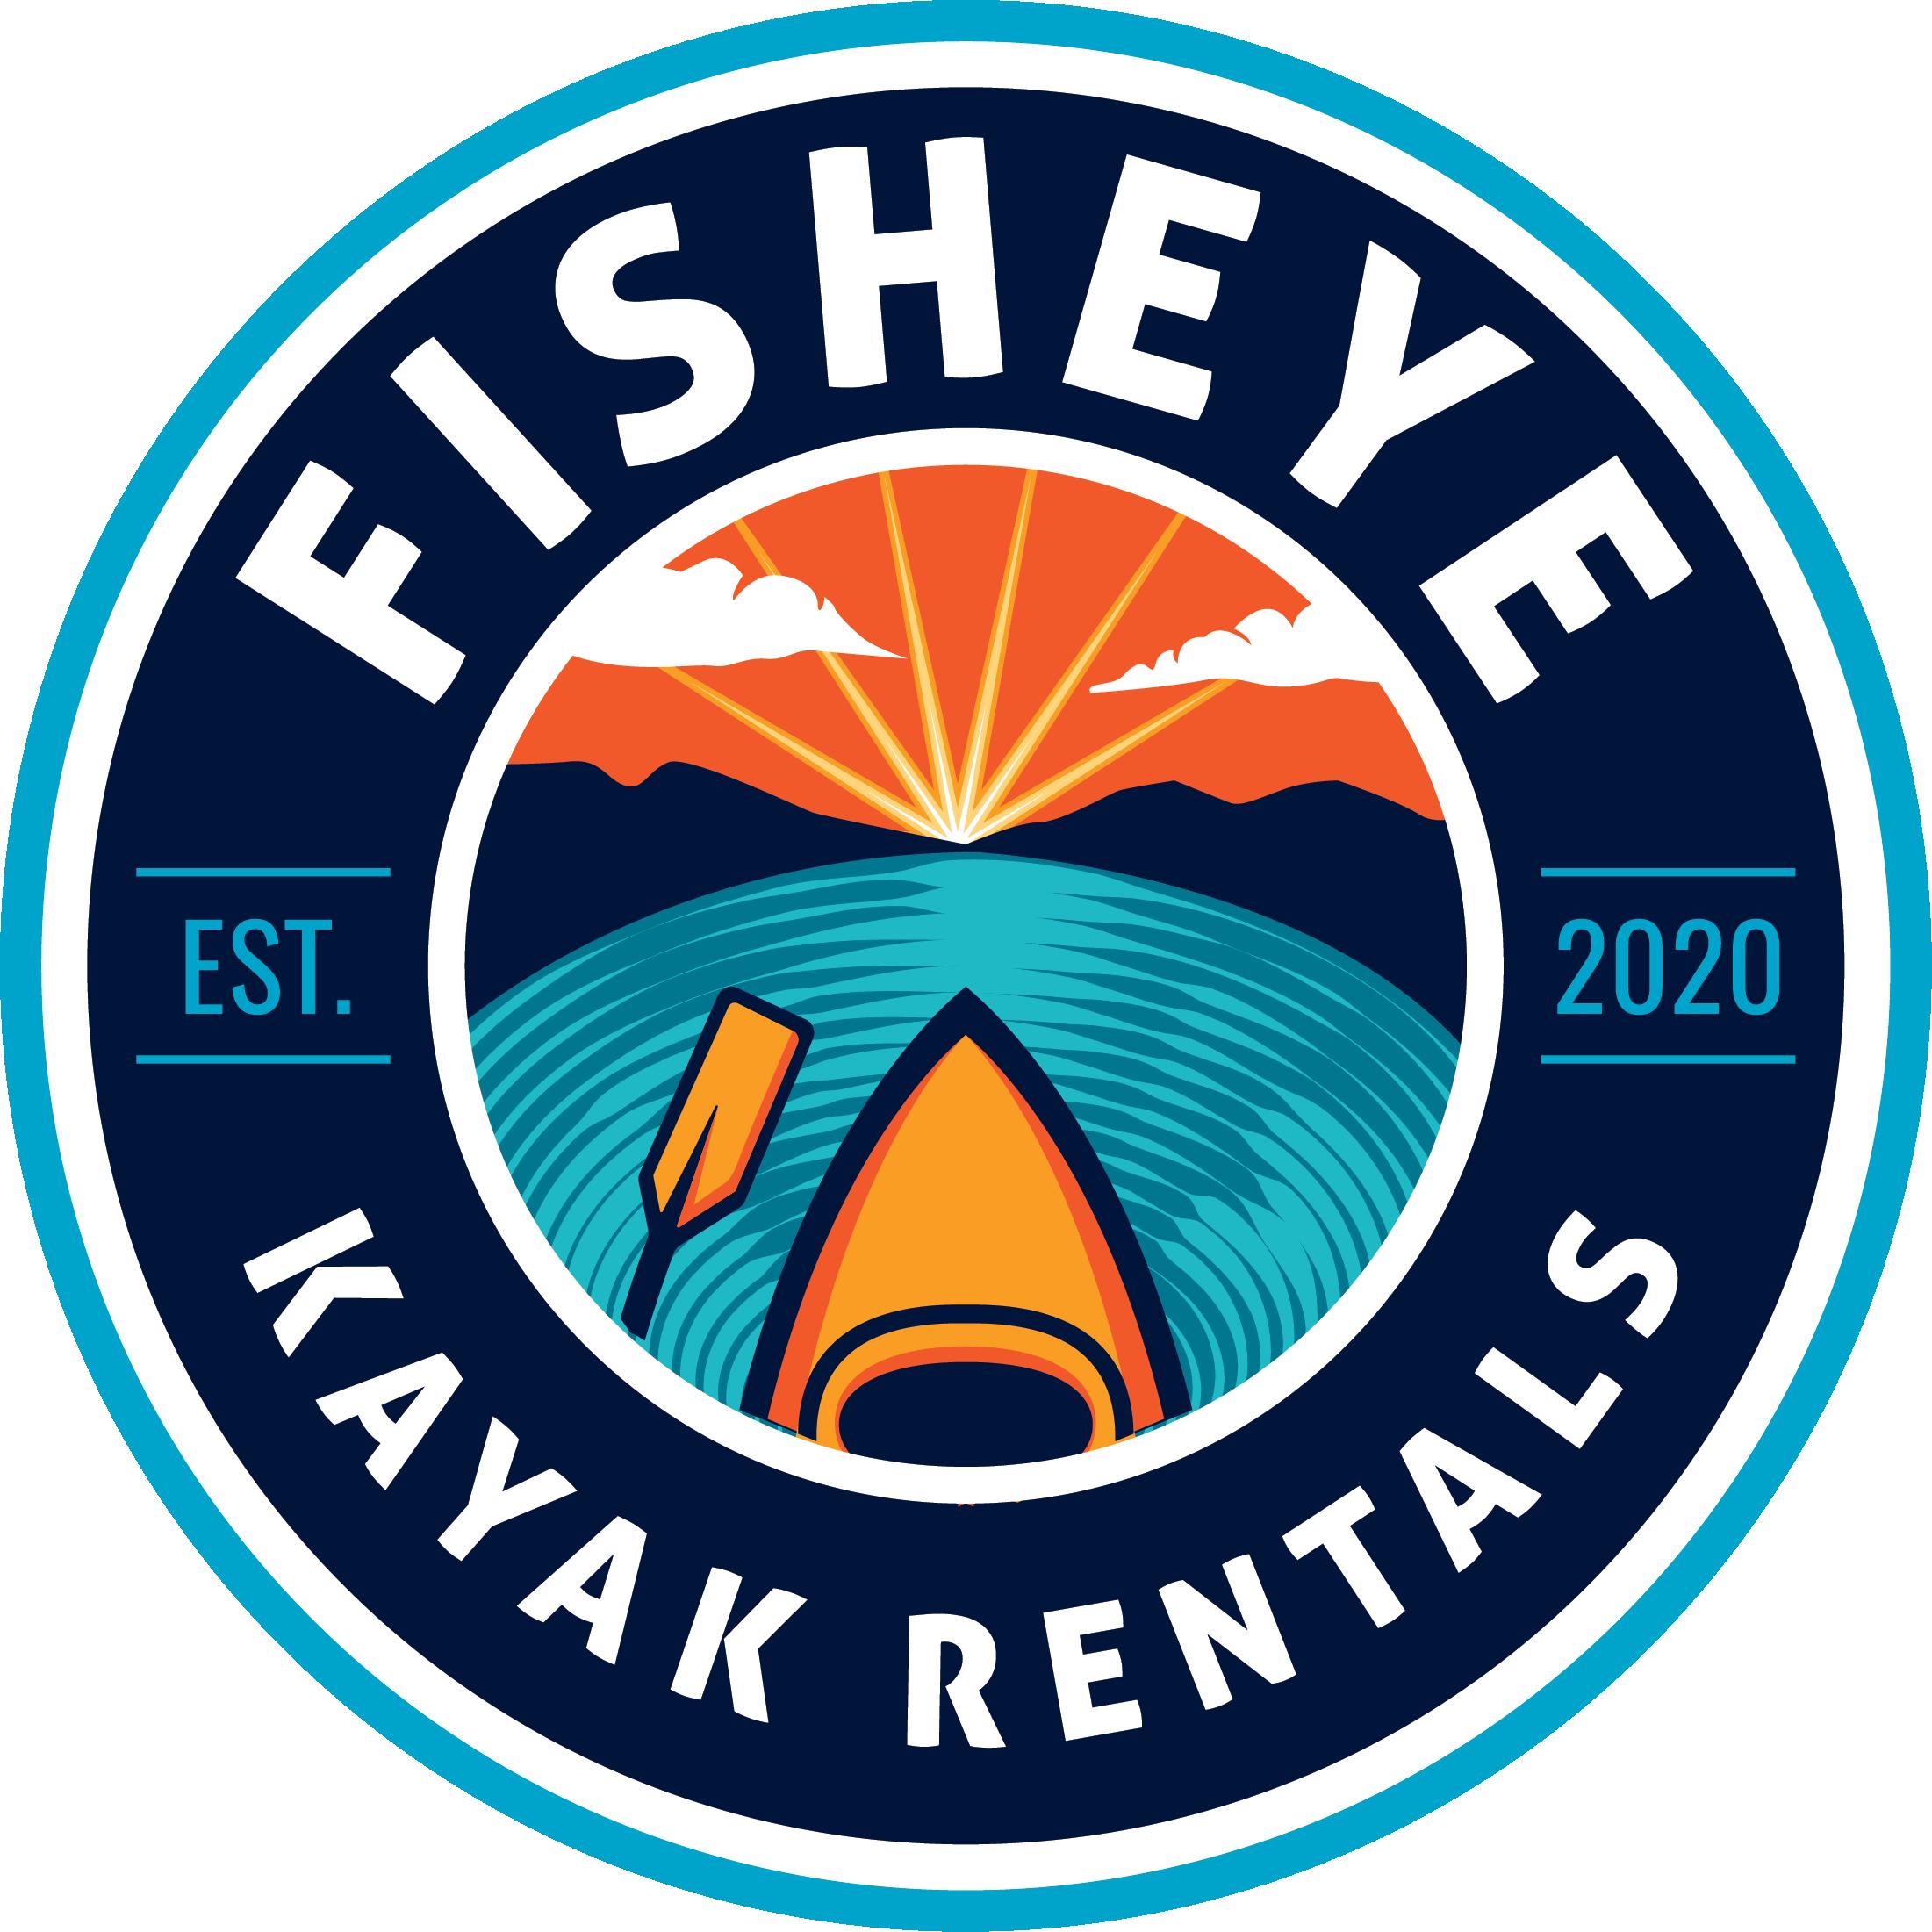 New kayak rental business seeks logo design to help establish our identity